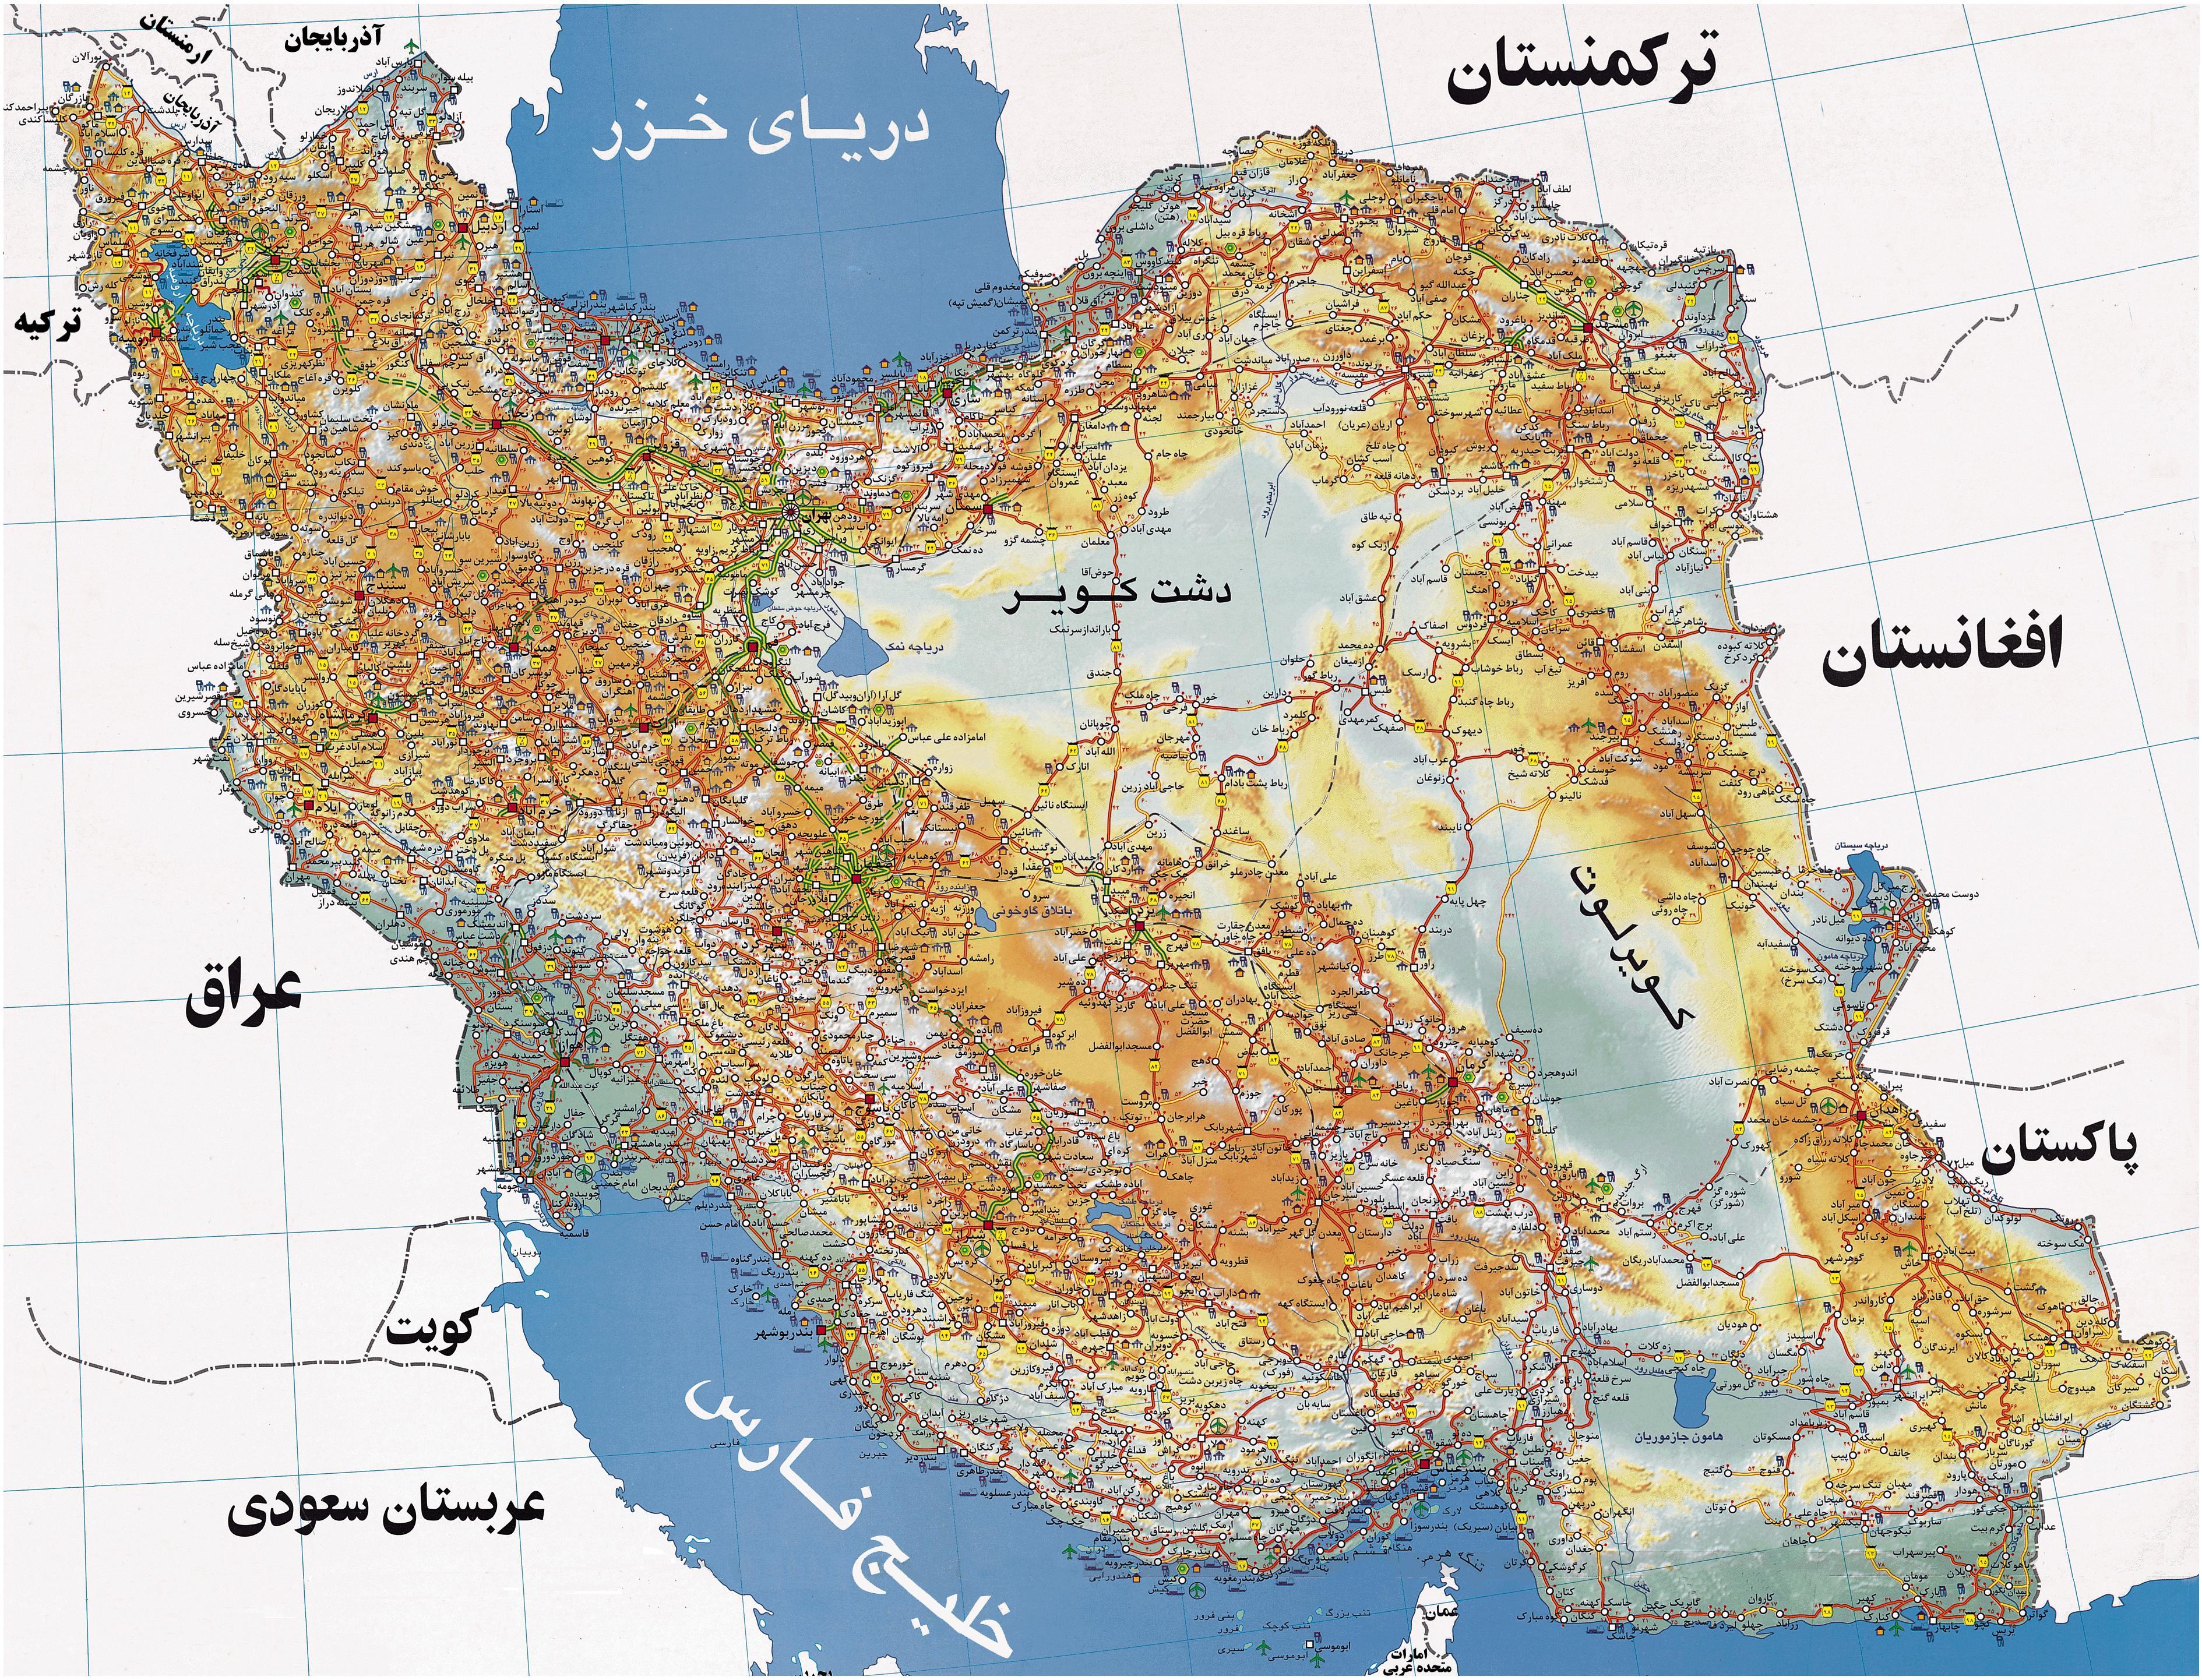 www.dustaan.com نقشه ایران / دانلود نقشه آفلاین راه های ایران با کیفیت بالا